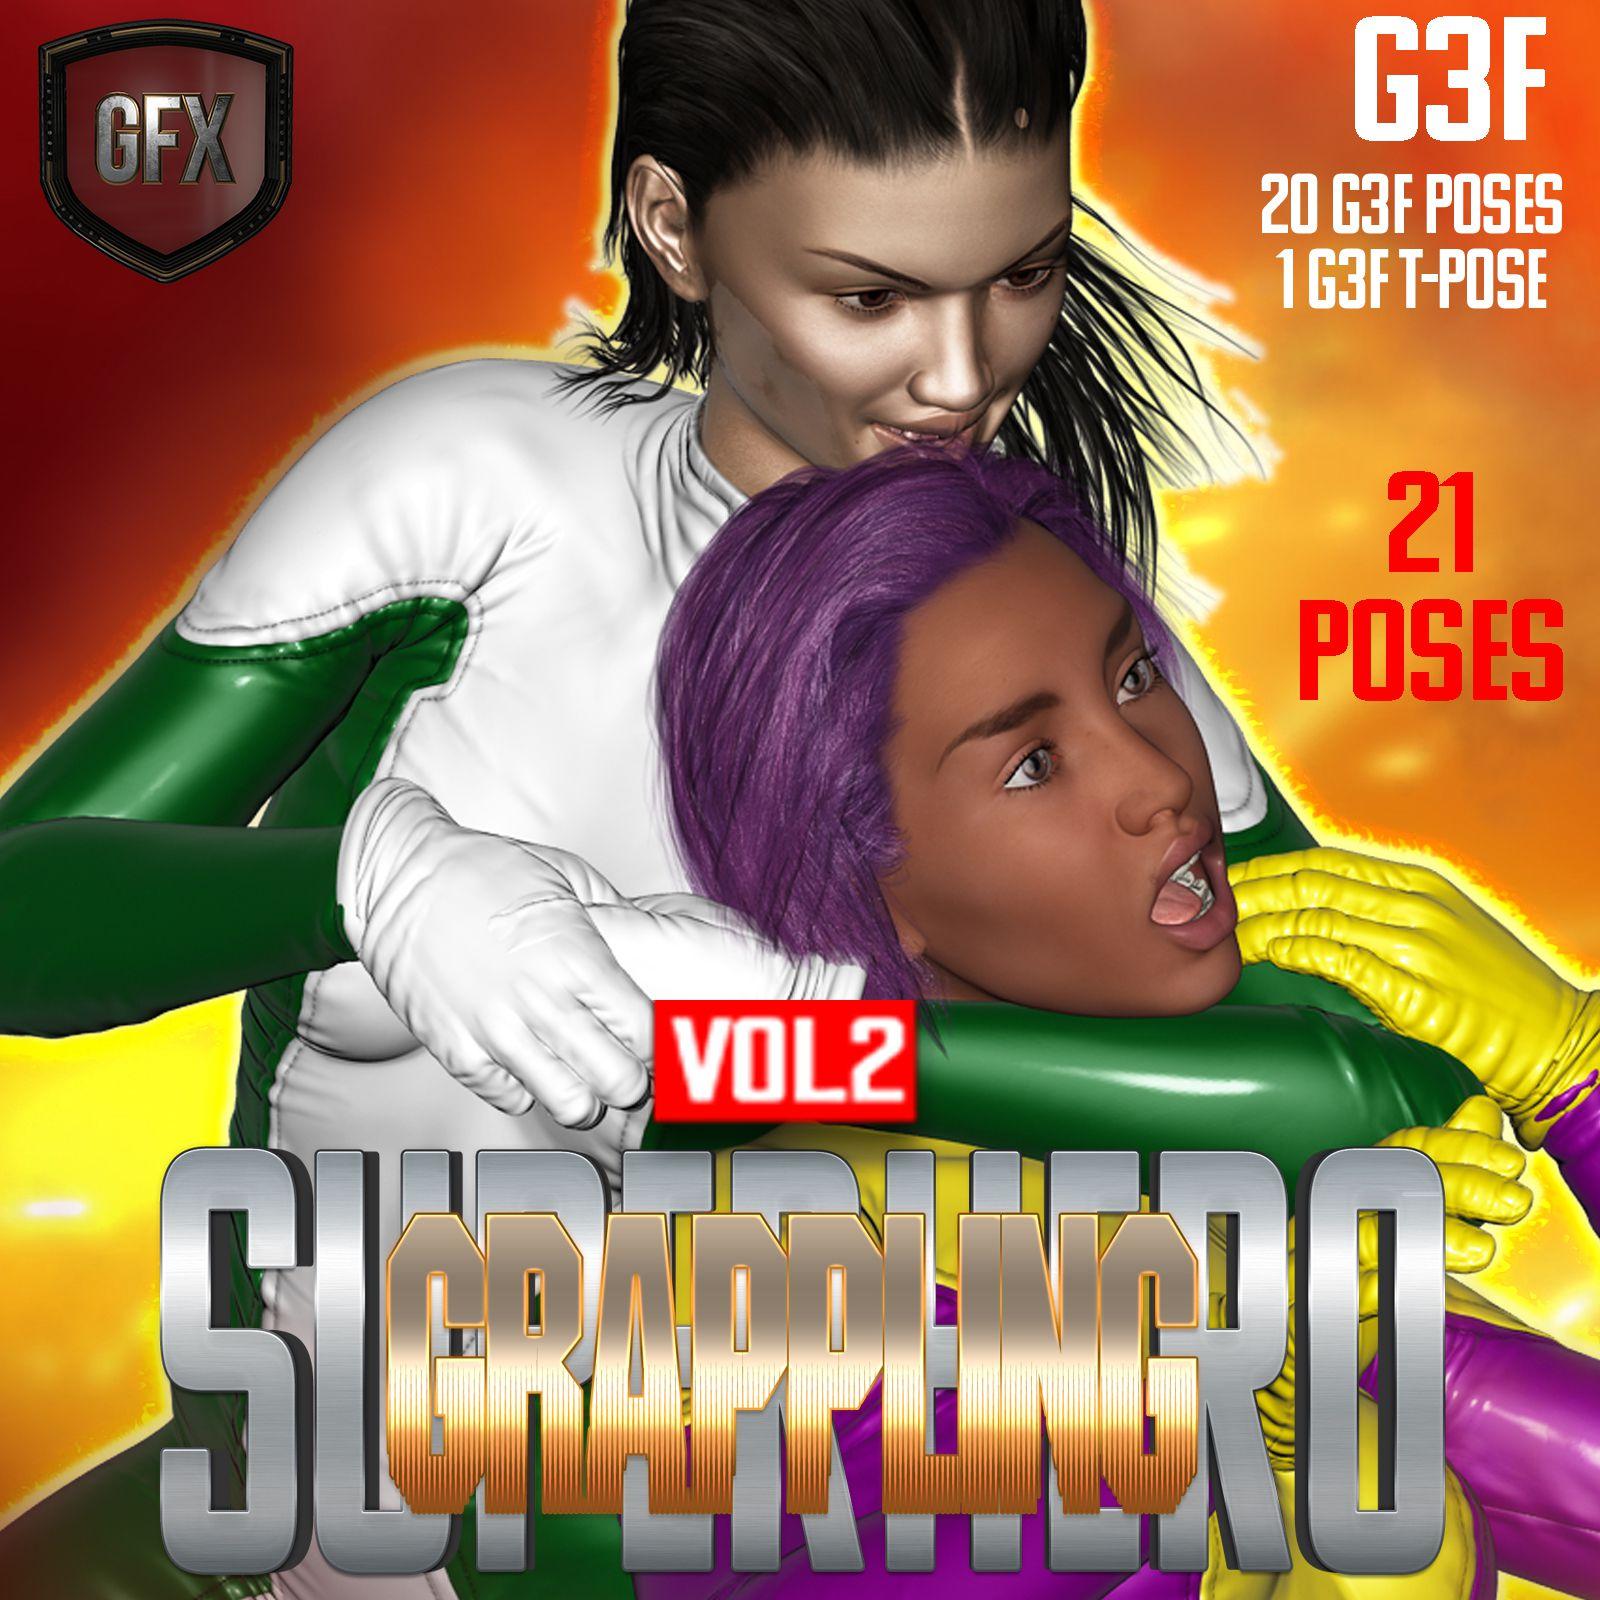 SuperHero Grappling for G3F Volume 2_DAZ3D下载站